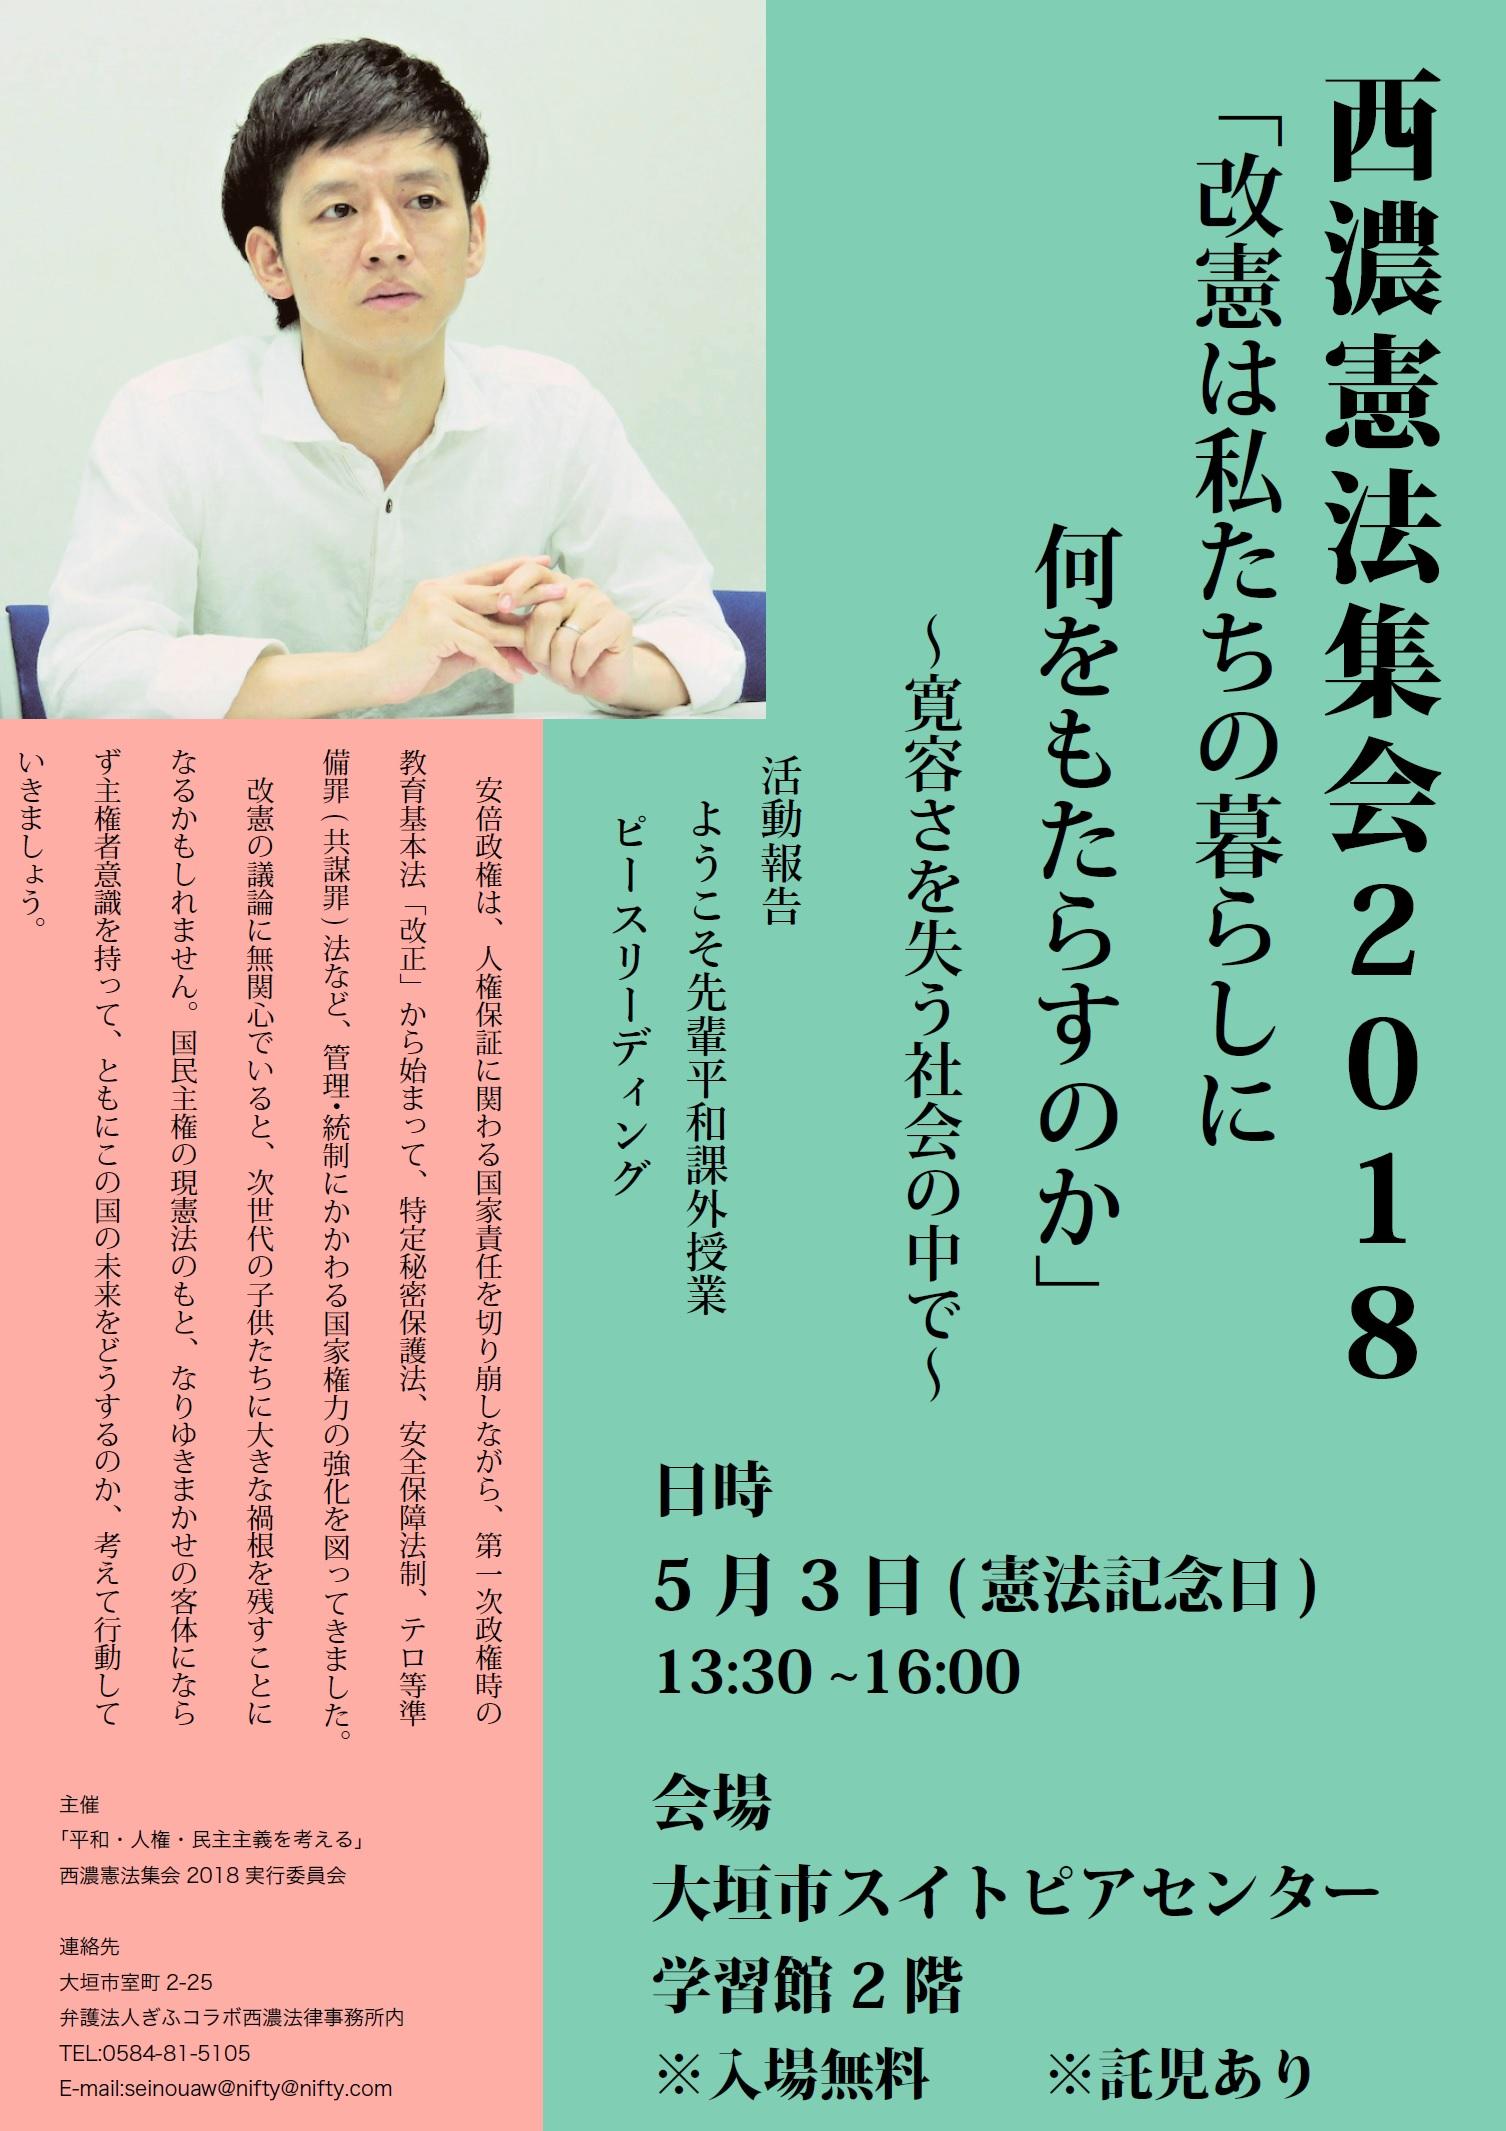 kenposyukai2018.jpg